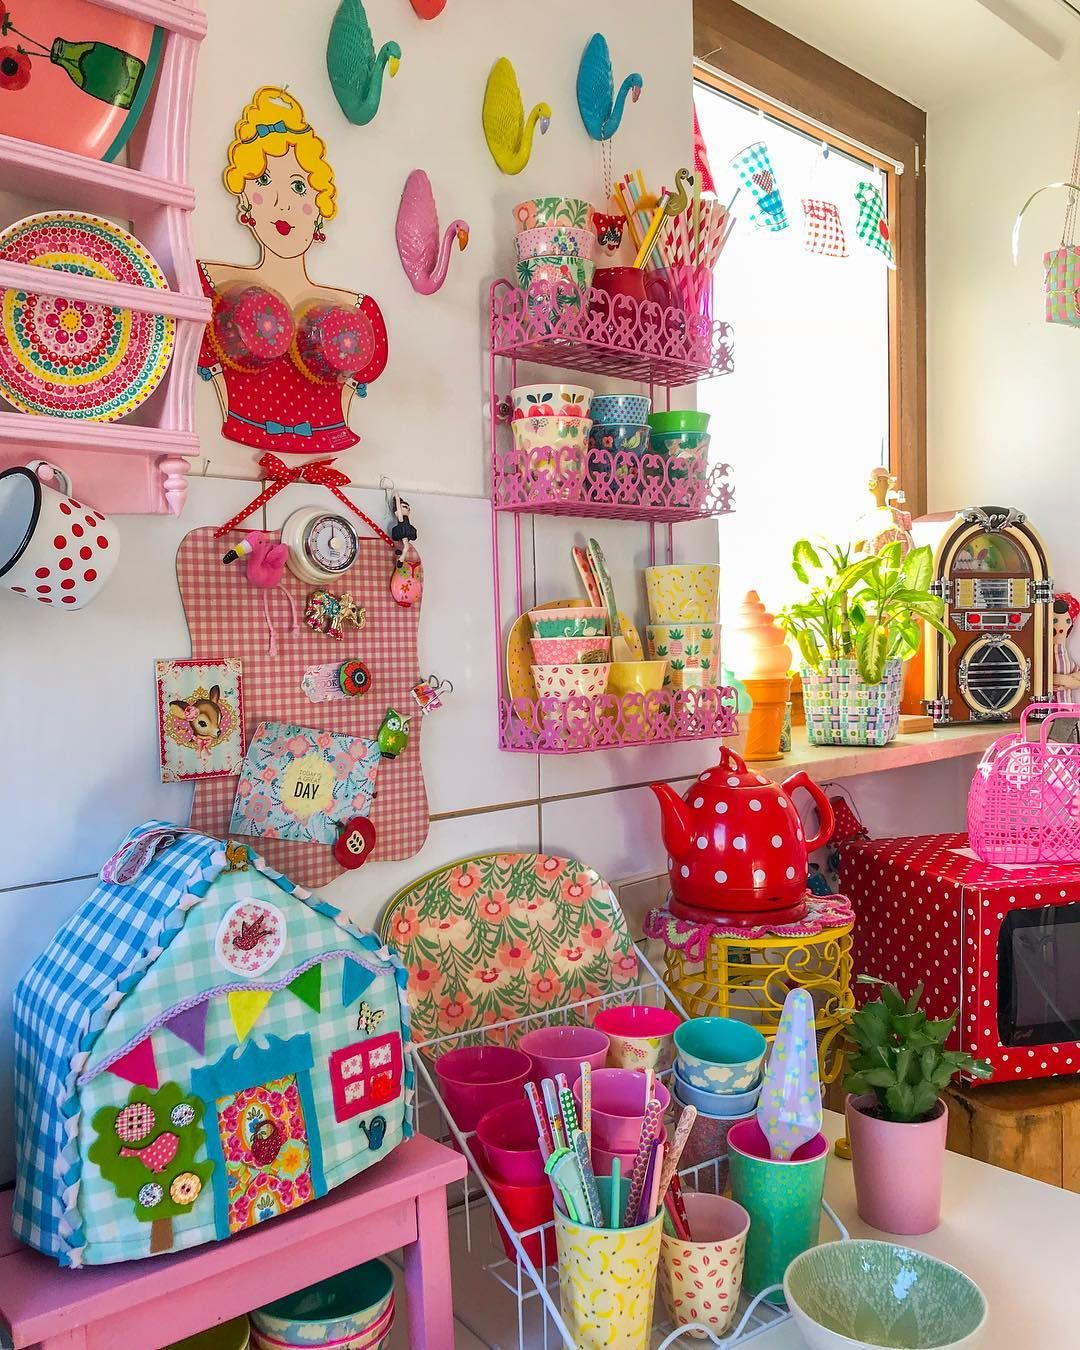 Colorful Kitchen Decor Pictures: Marfi-topia In 2019